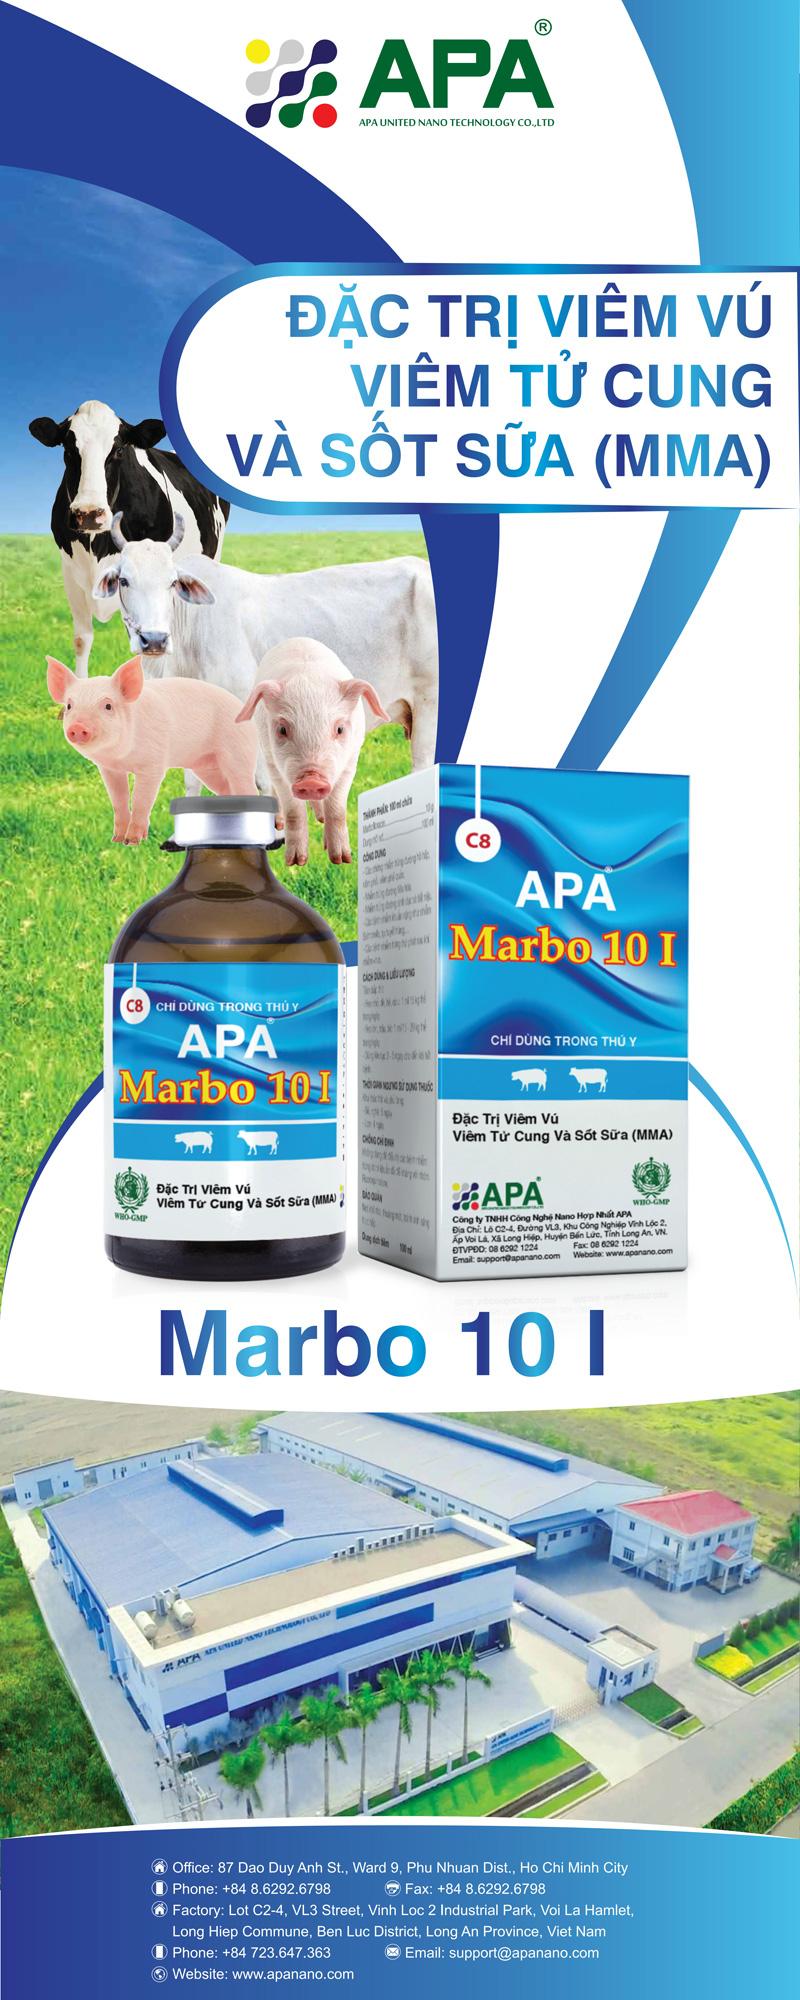 APA-Marbo-10-I_Standee